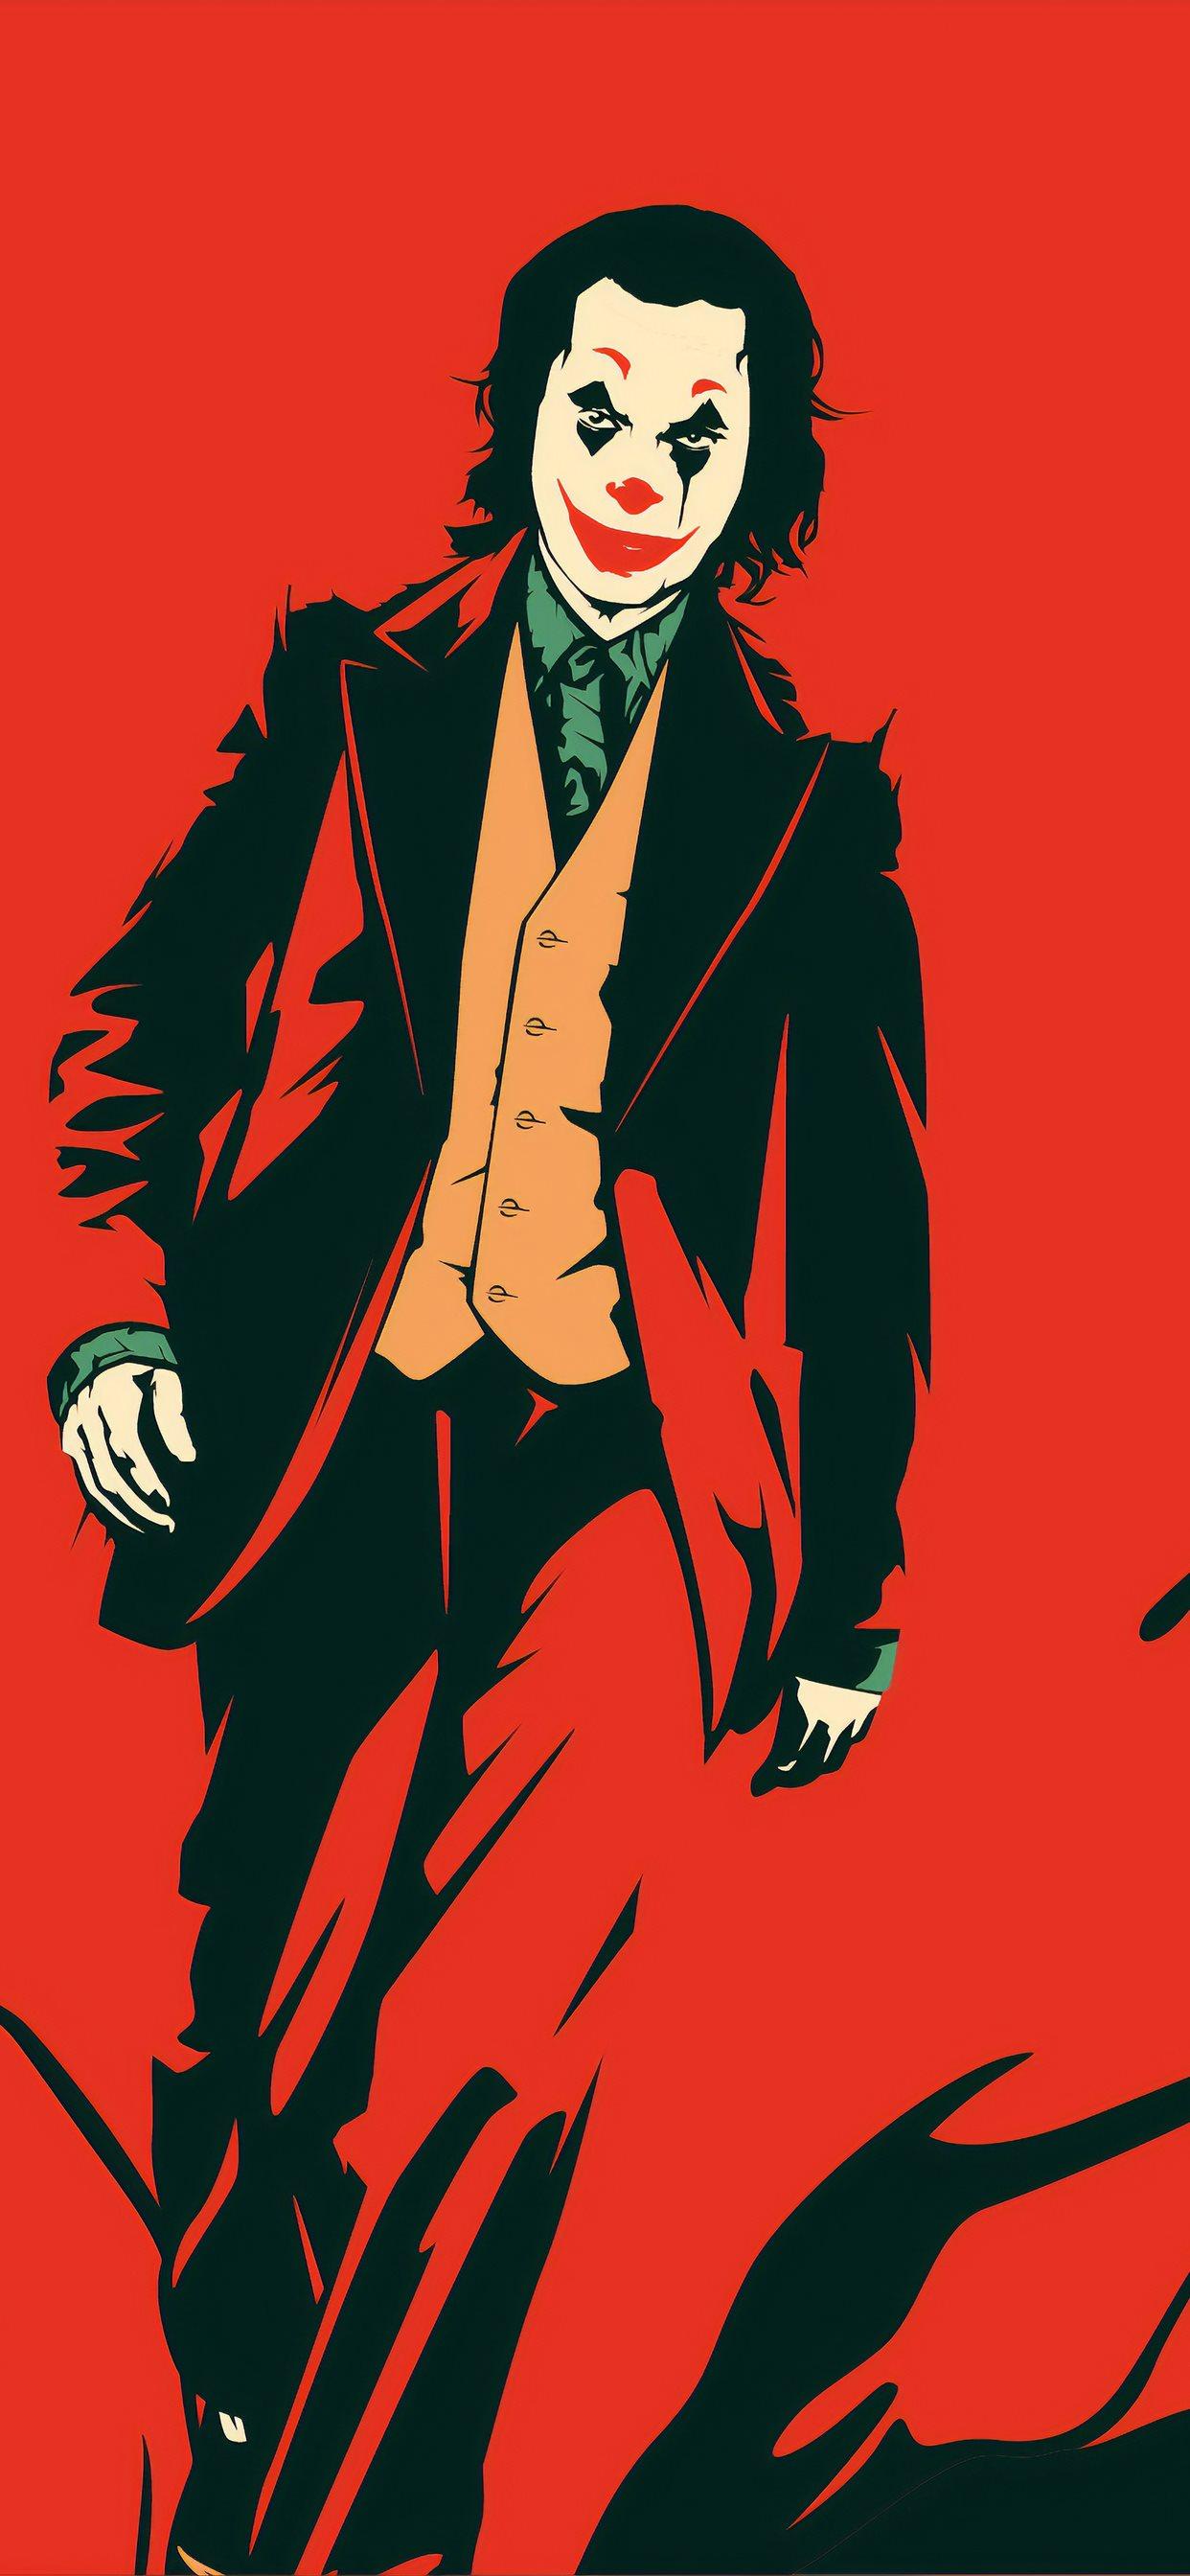 Joker Red 4k Iphone 11 Wallpapers Free Download